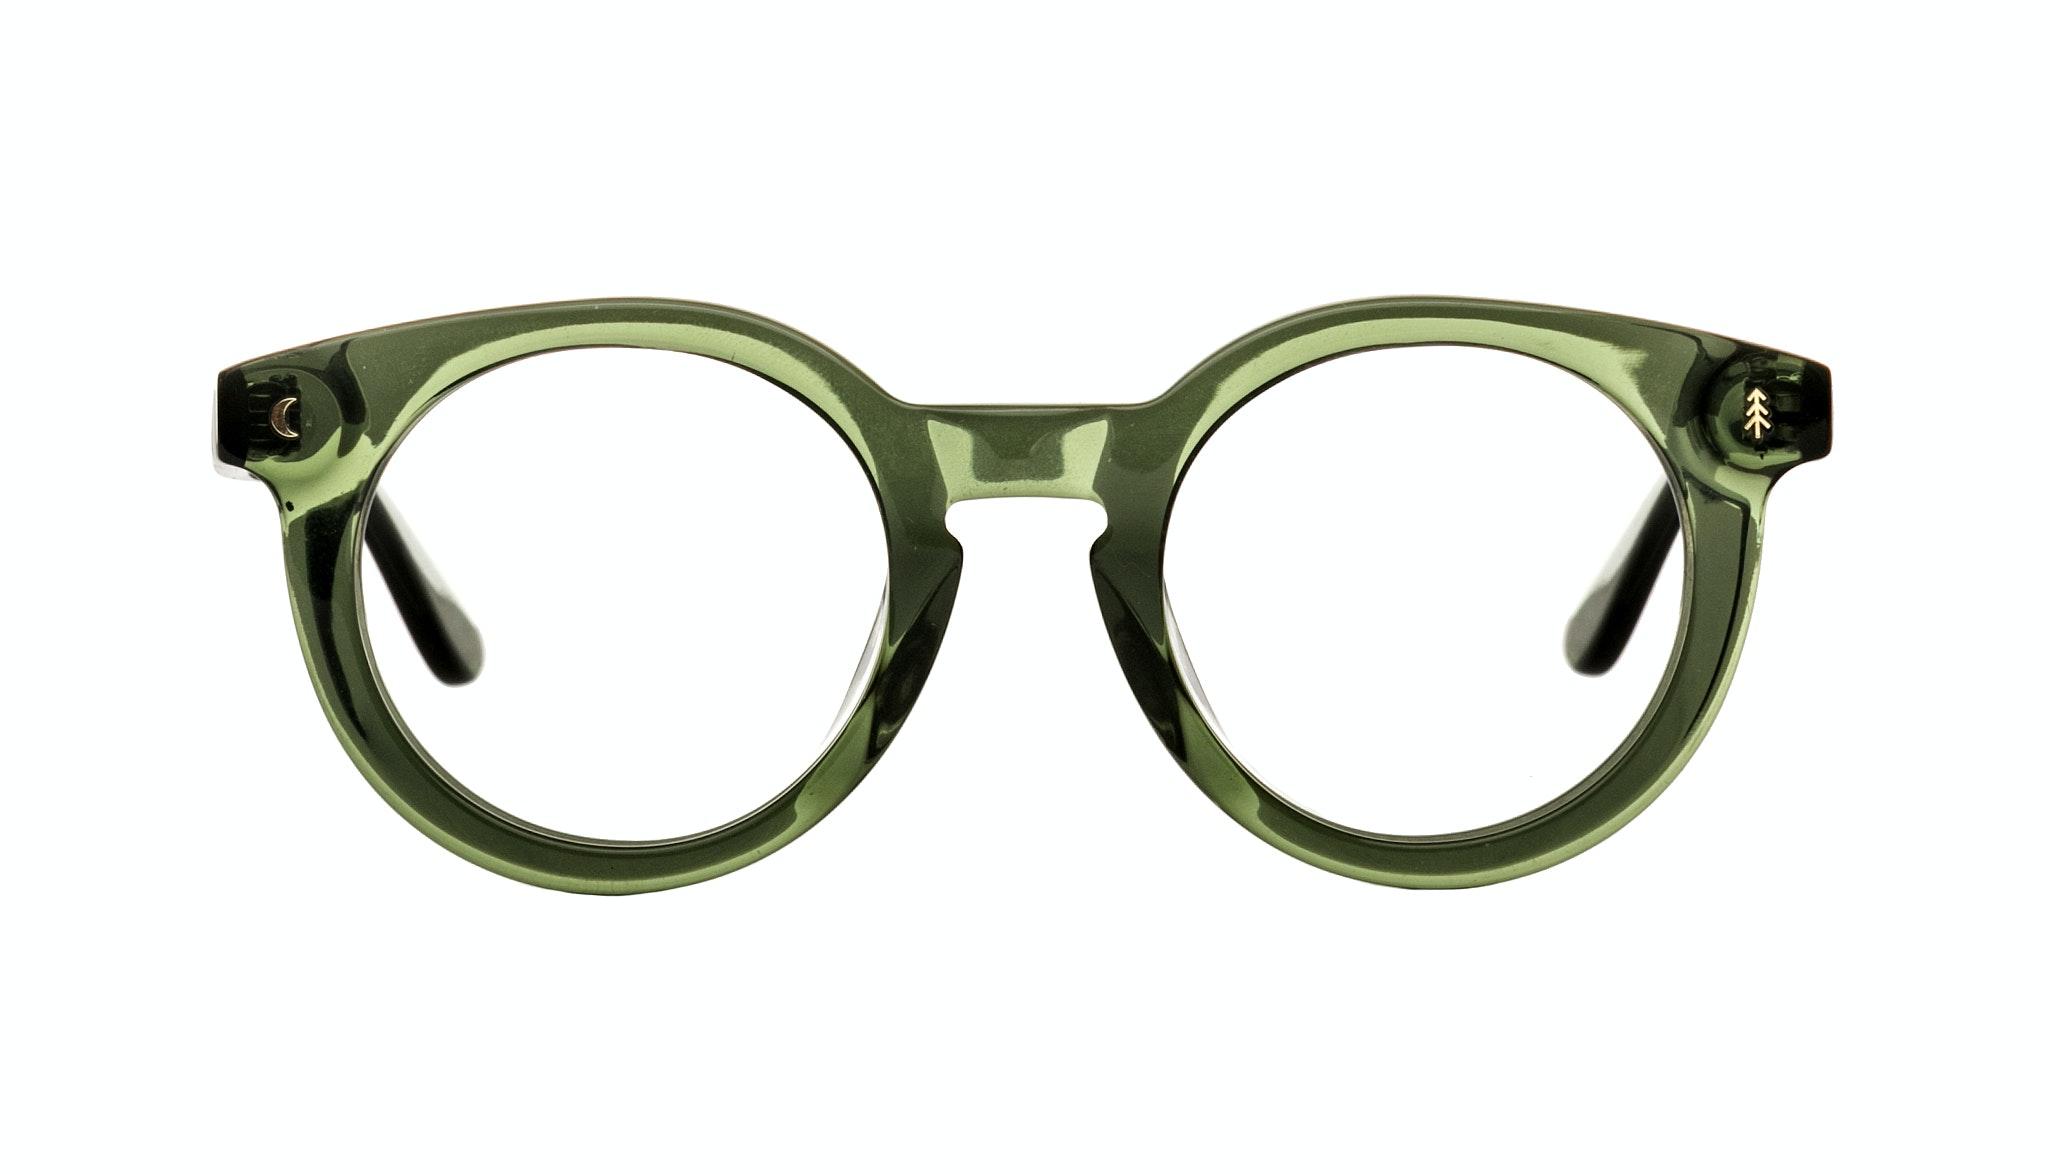 Affordable Fashion Glasses Round Eyeglasses Women Trailblazer Moss Green Front